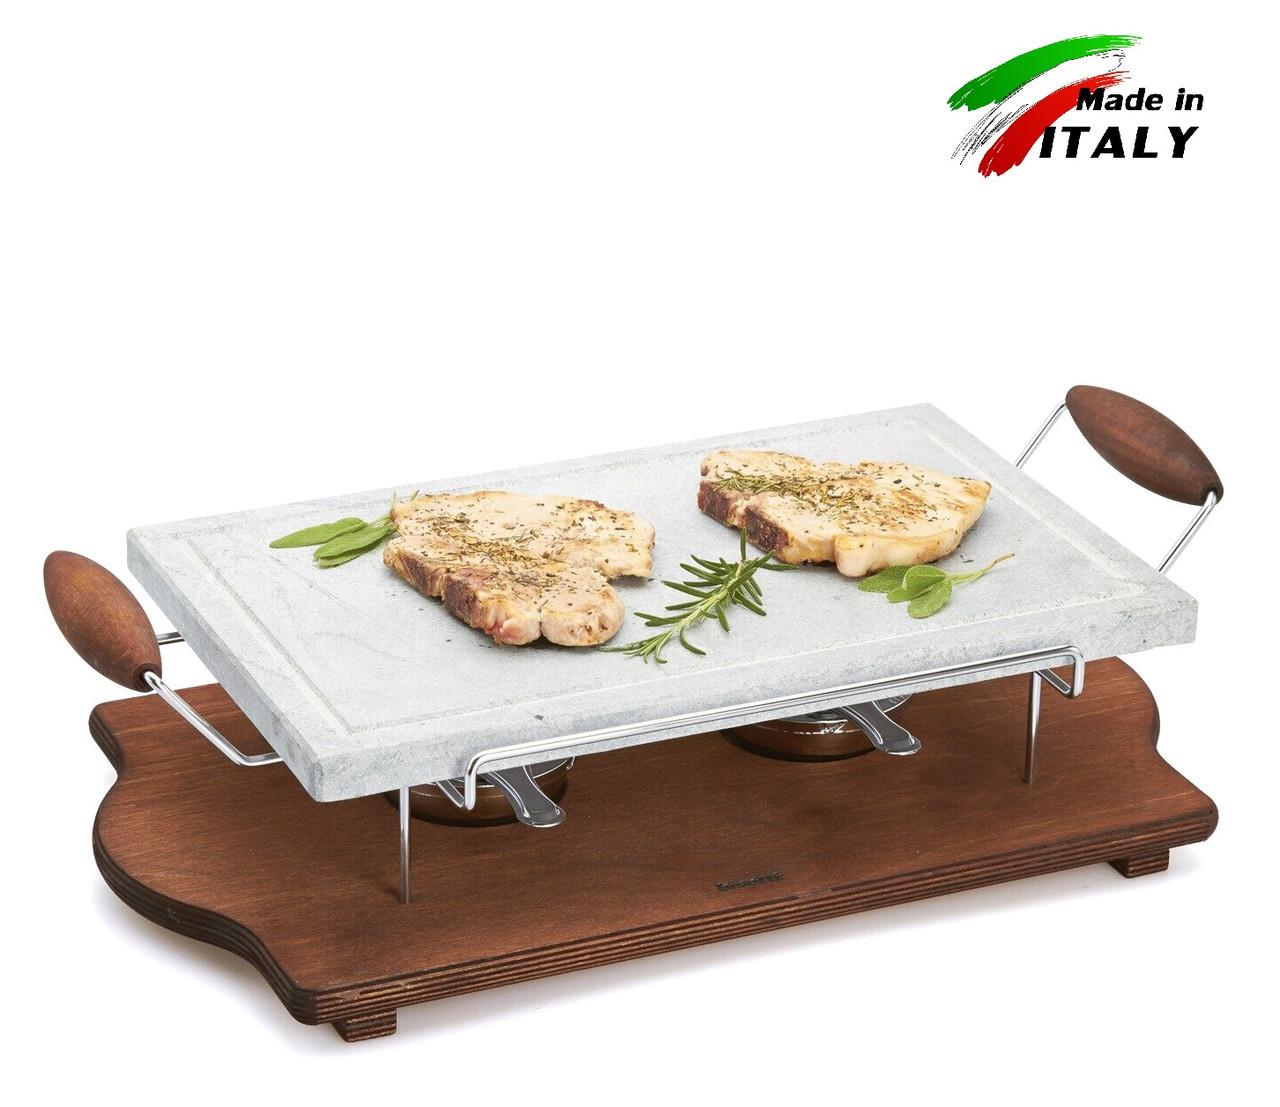 Каменная жарочная поверхность-гриль камень Hot Stone Grill Bisetti 99024 для жарки мяса овощей дома, ресторане